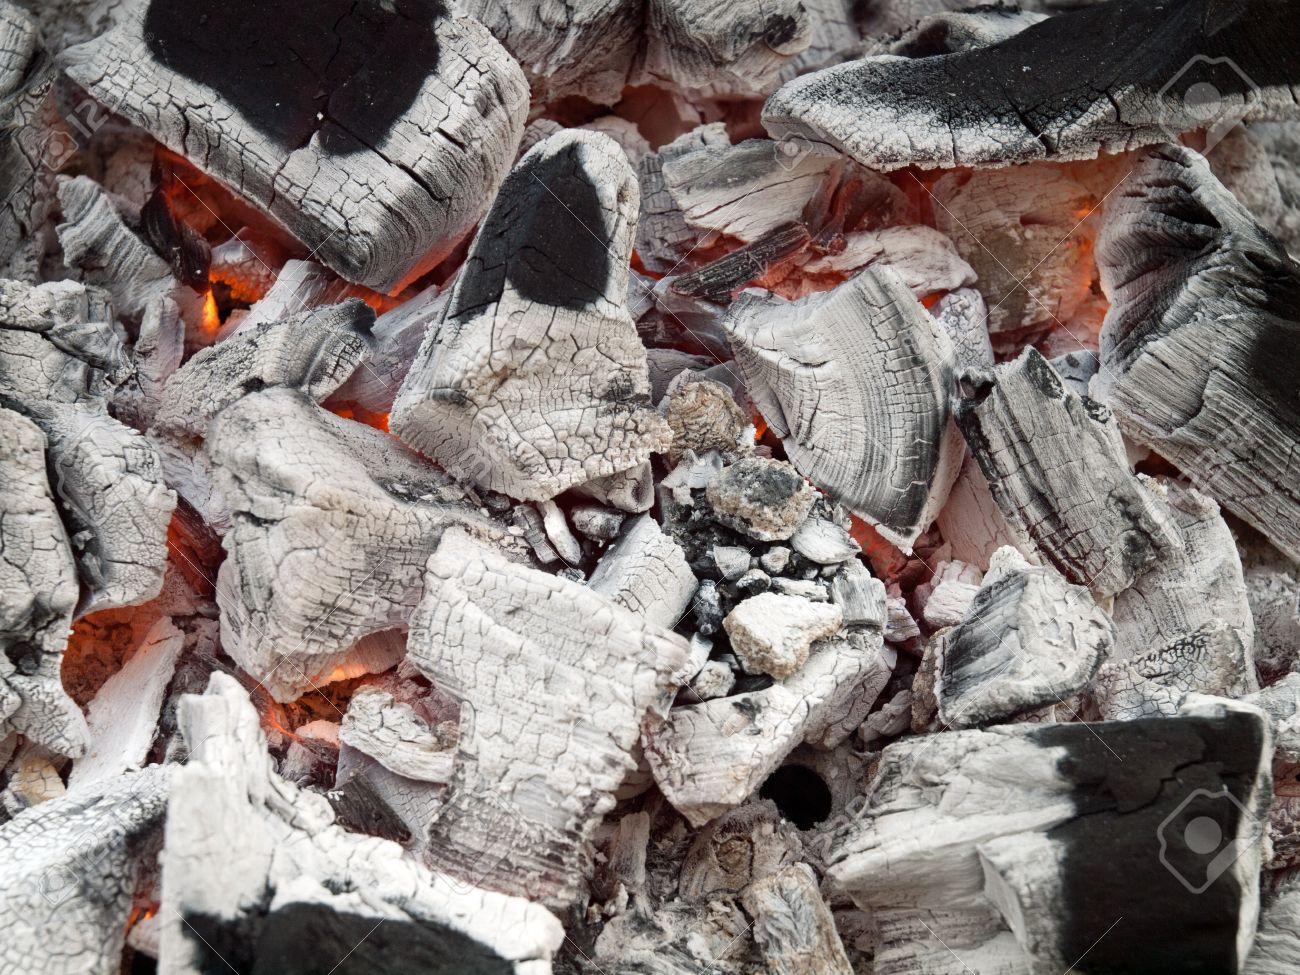 Smoldering lump charcoal of the quebracho tree premium grade restaurant and barbeque lumpwood charcoal stock